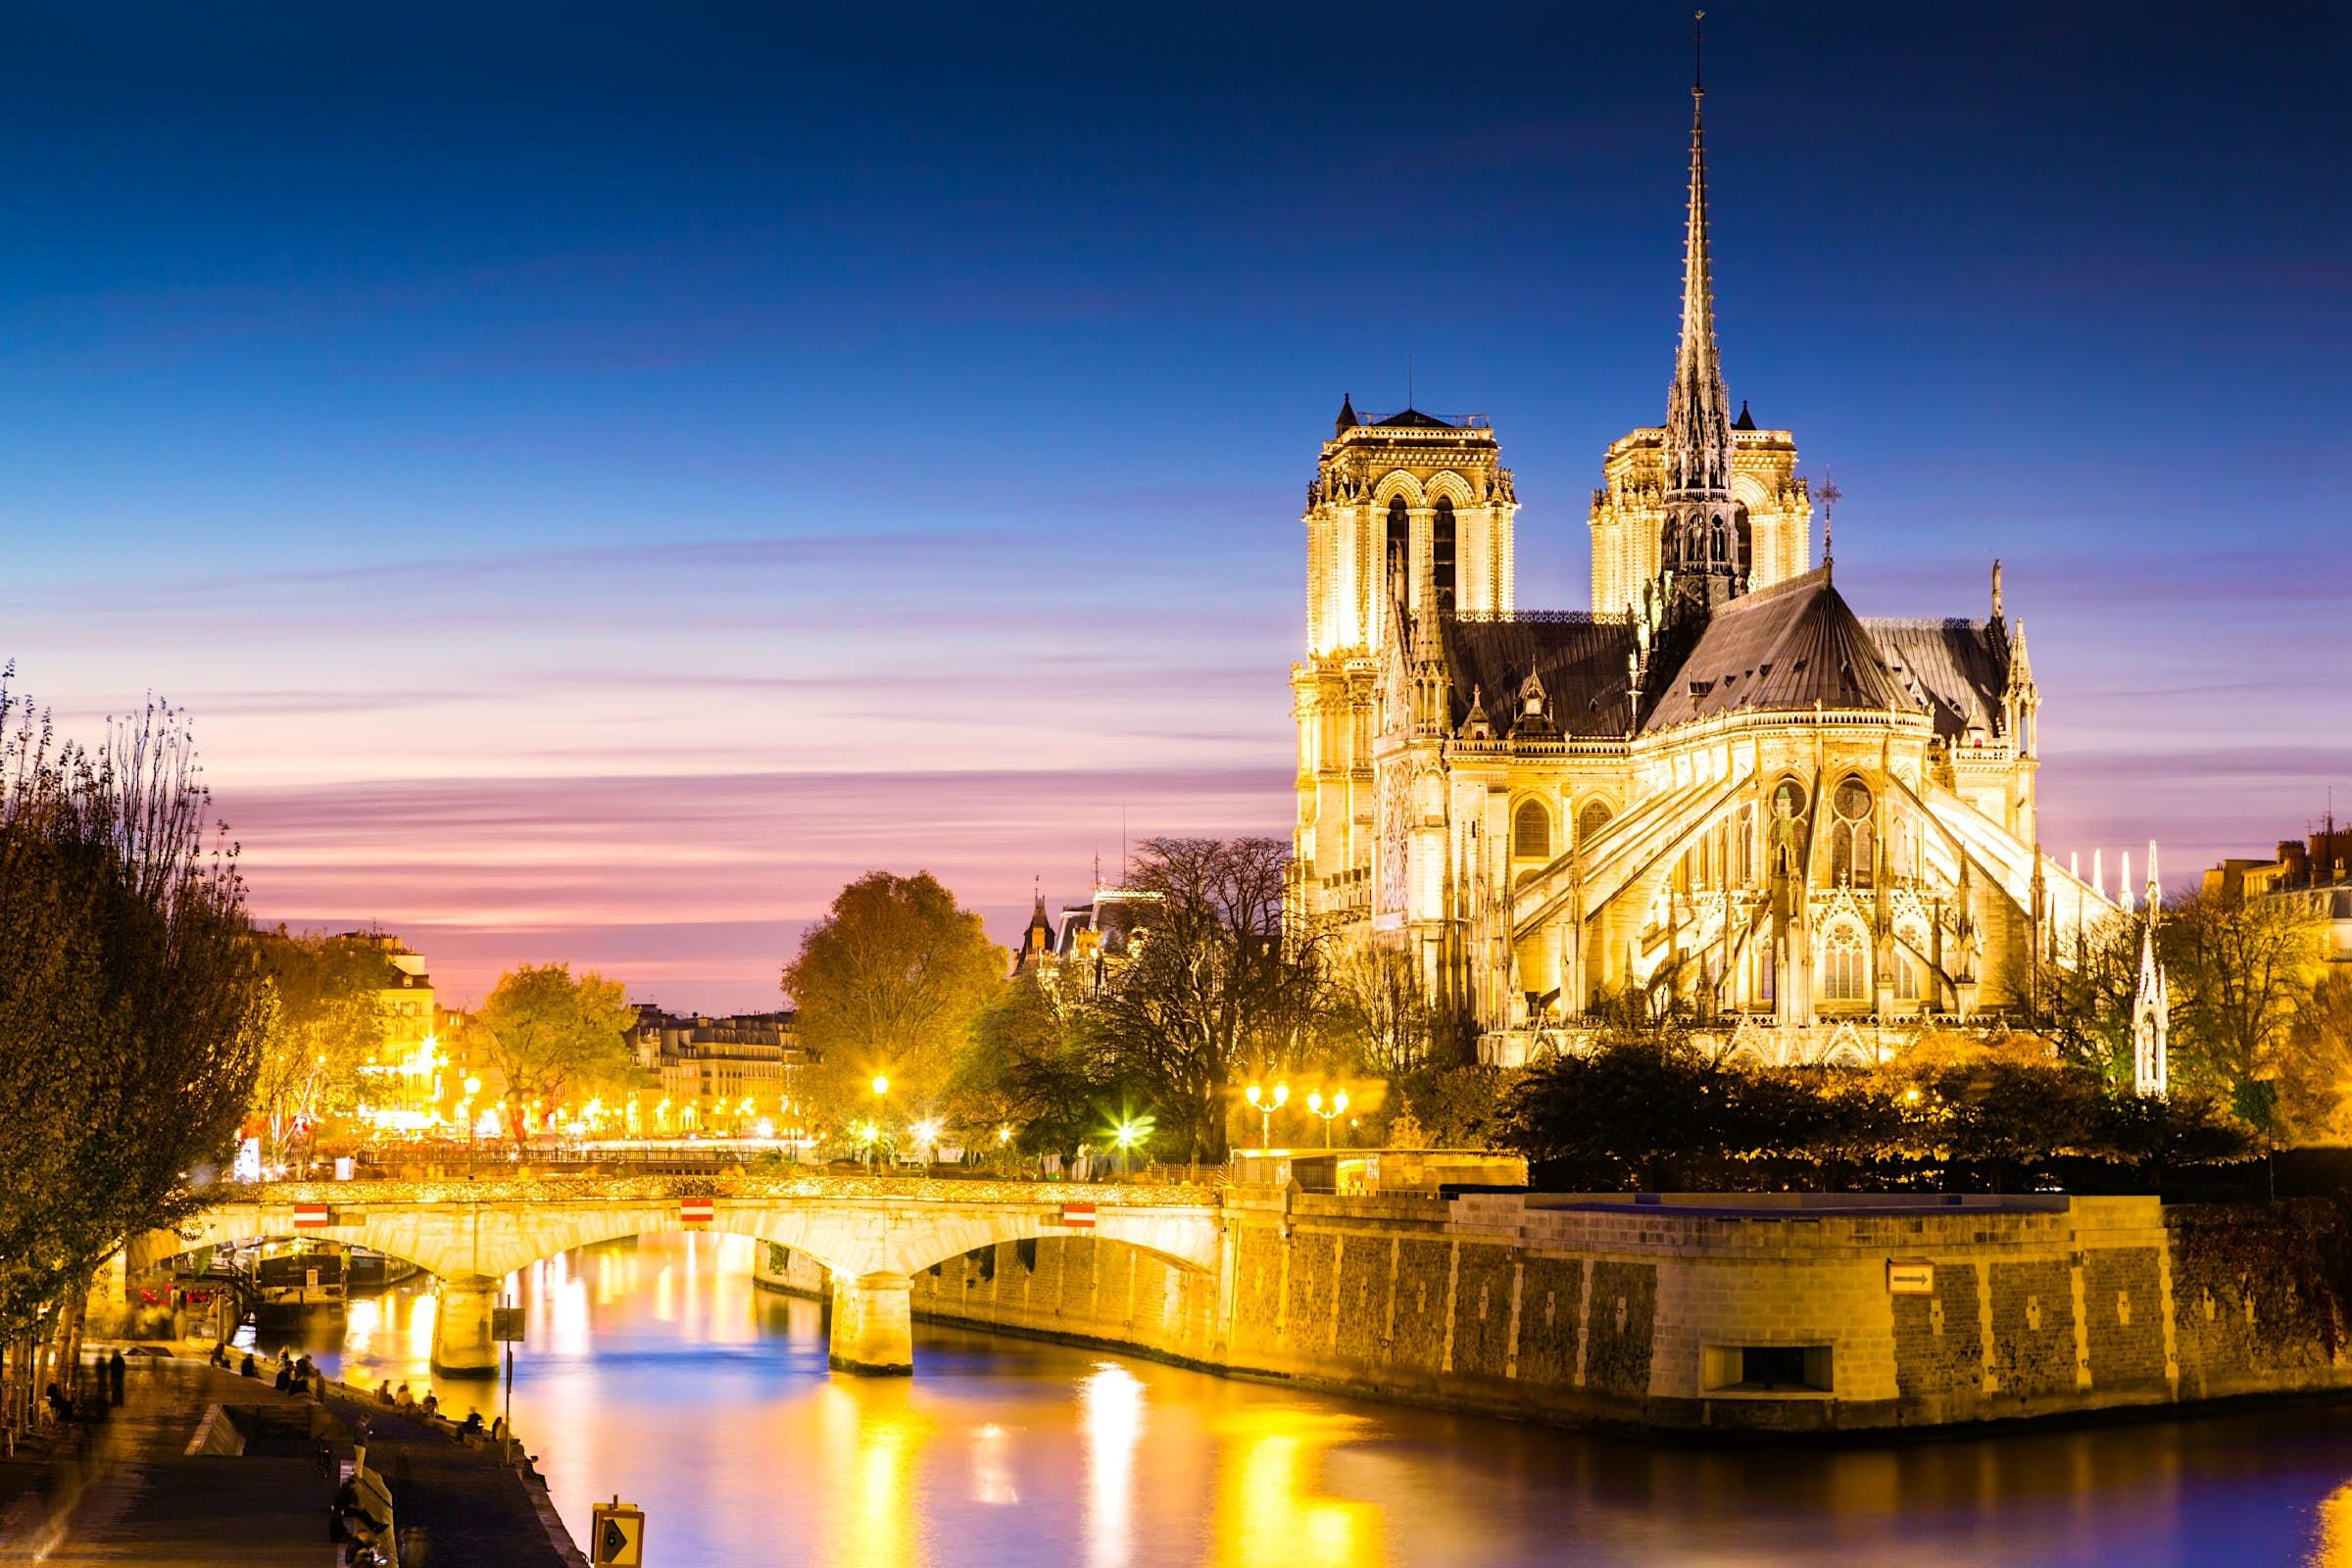 La catedral de Notre Dame se iluminó al anochecer